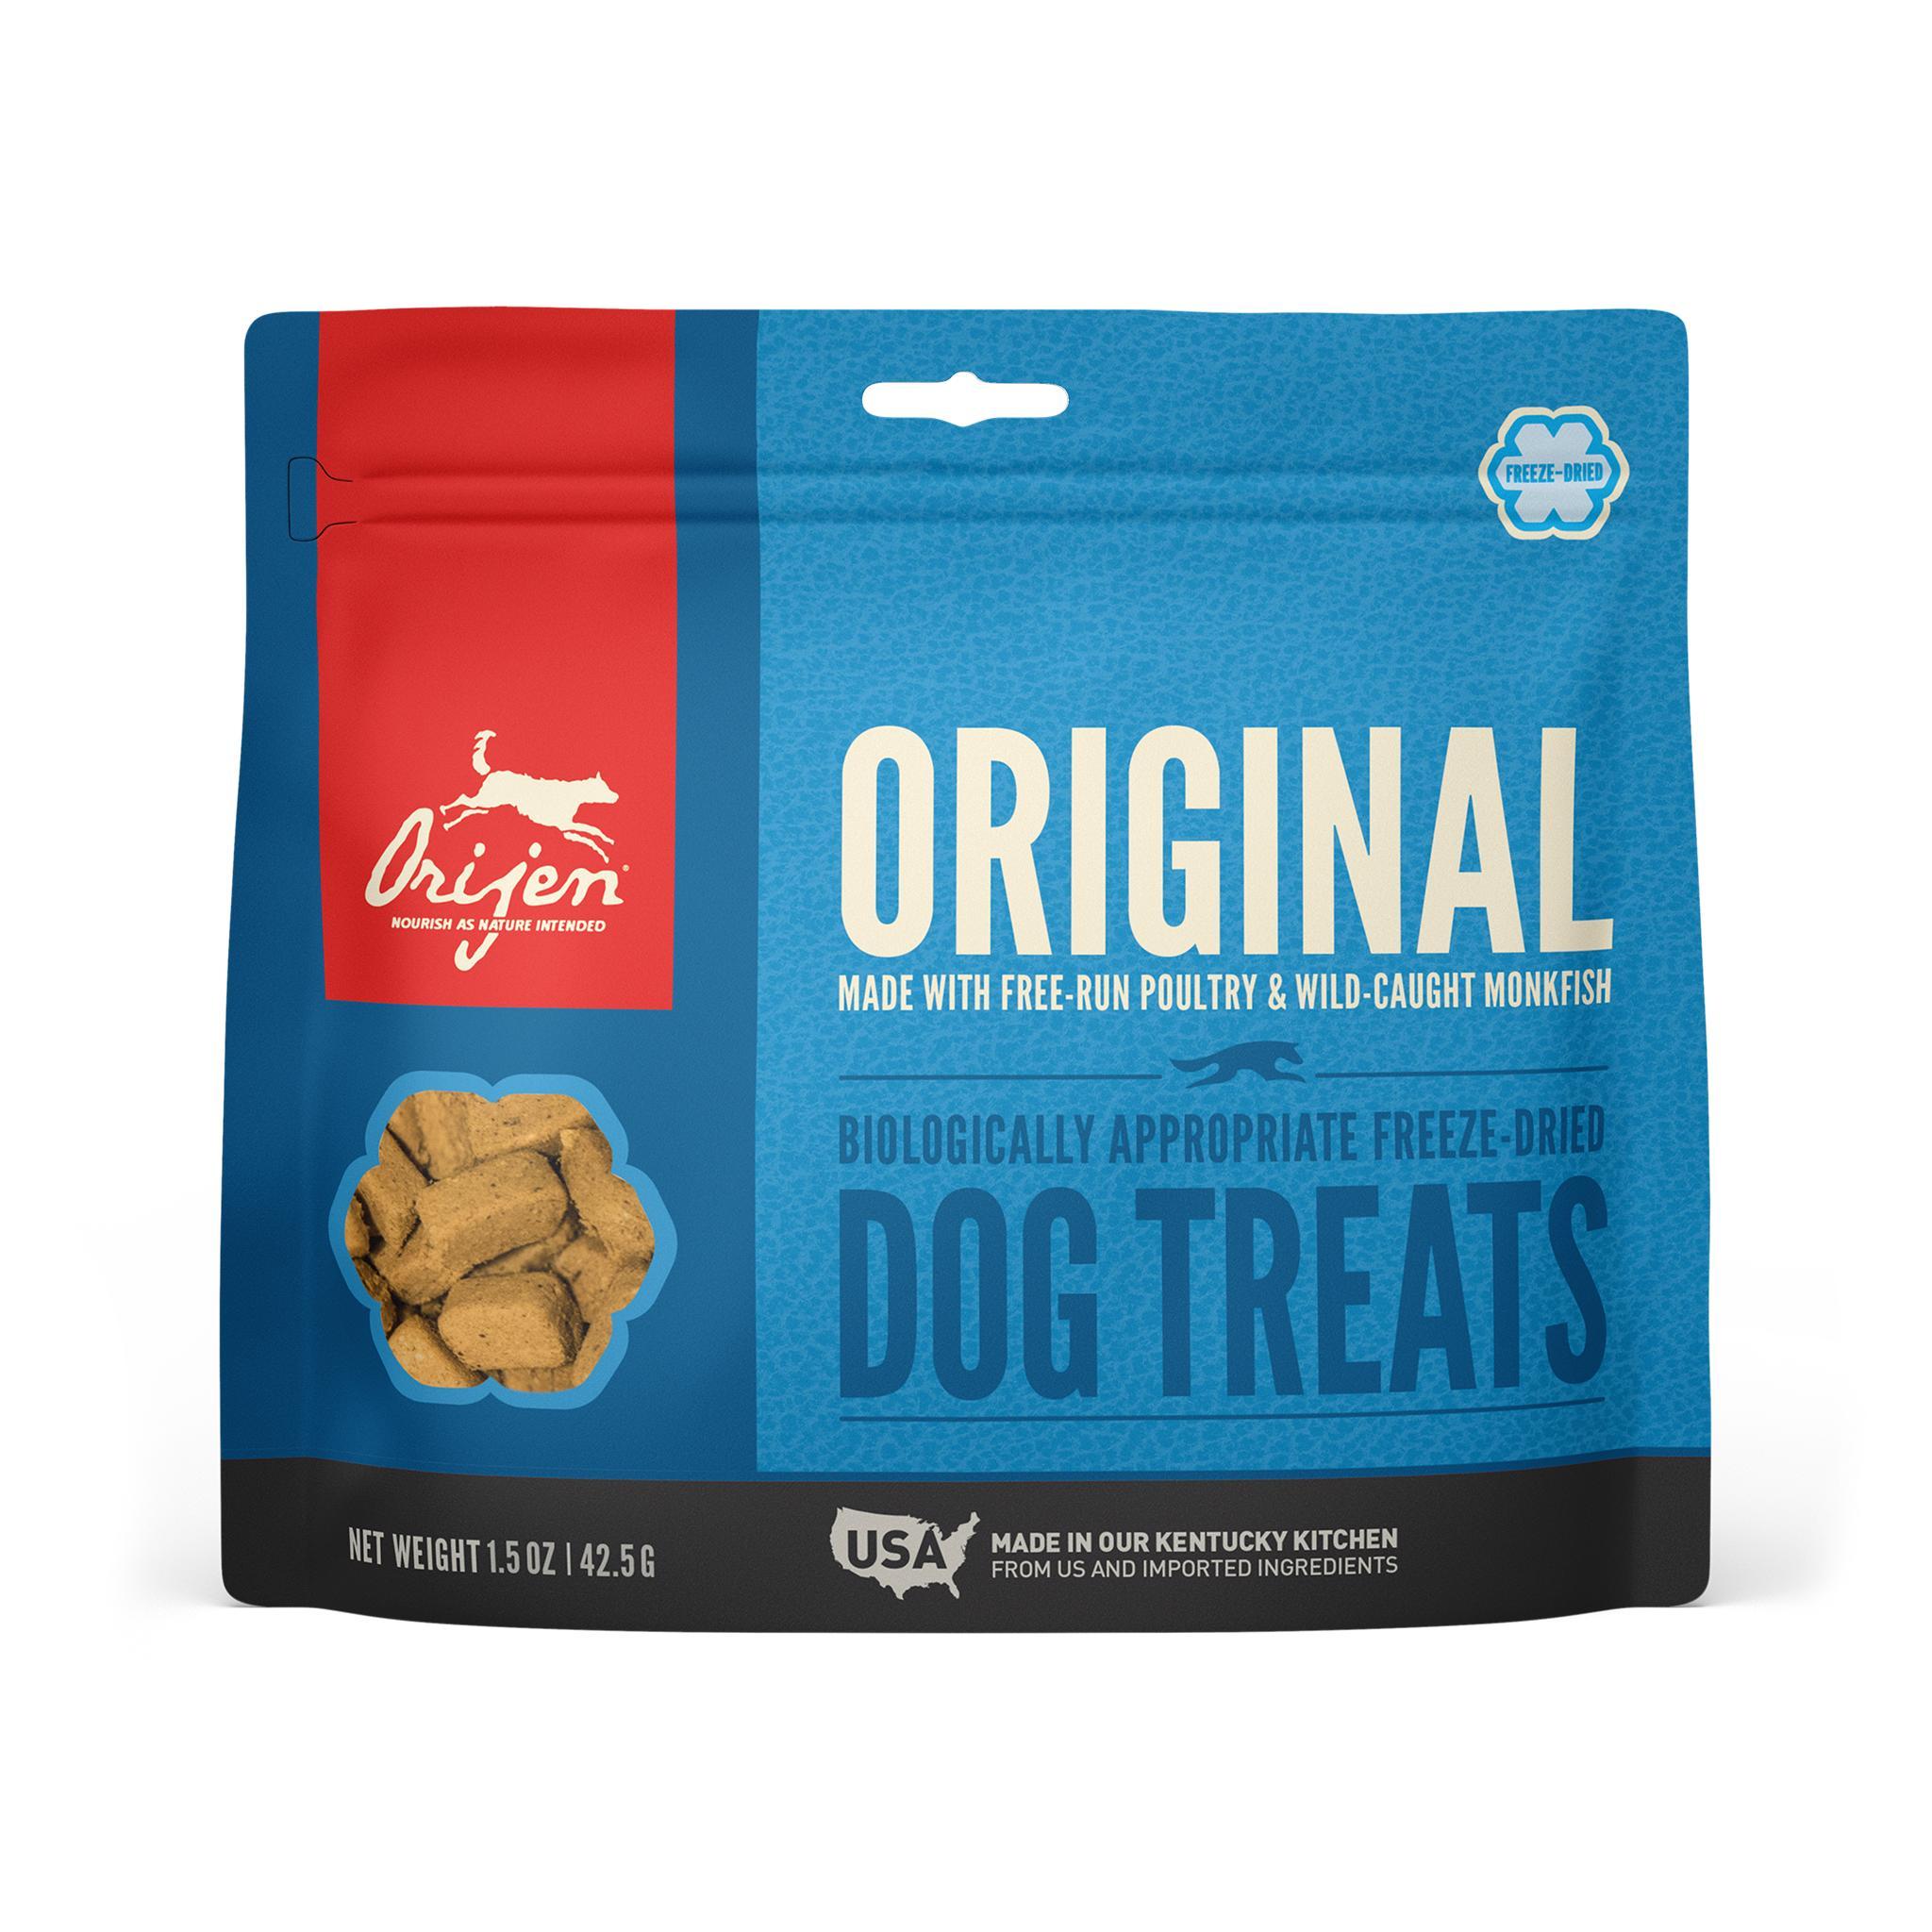 ORIJEN Original Grain-Free Freeze-Dried Dog Treats Image